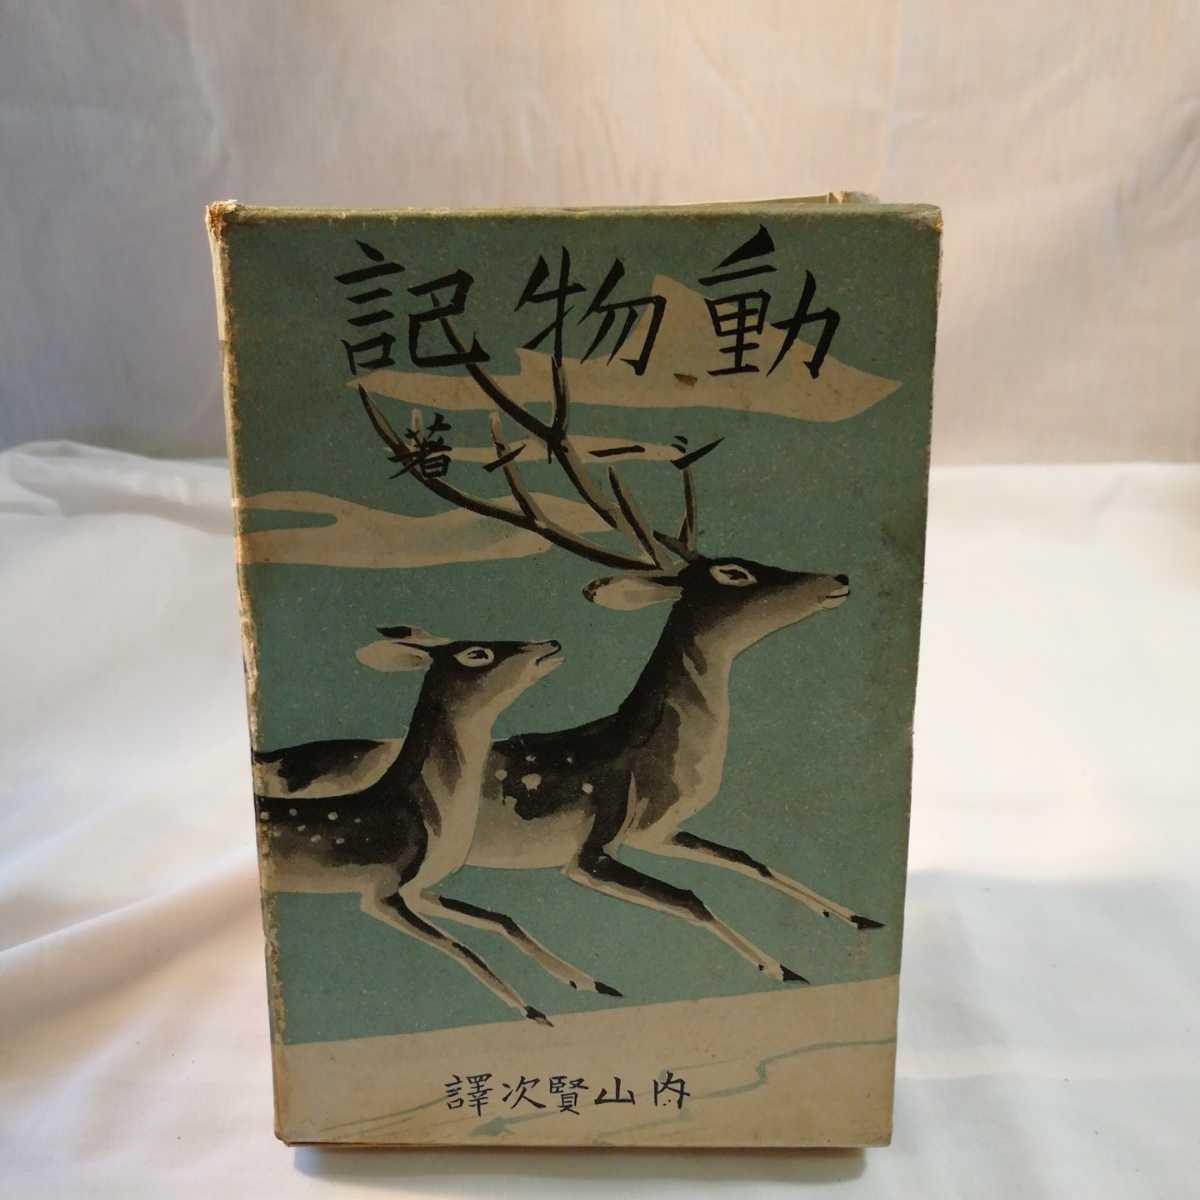 PayPayフリマ|動物記 第二冊 シートン 著 内山賢次 訳 昭和15年発行再版